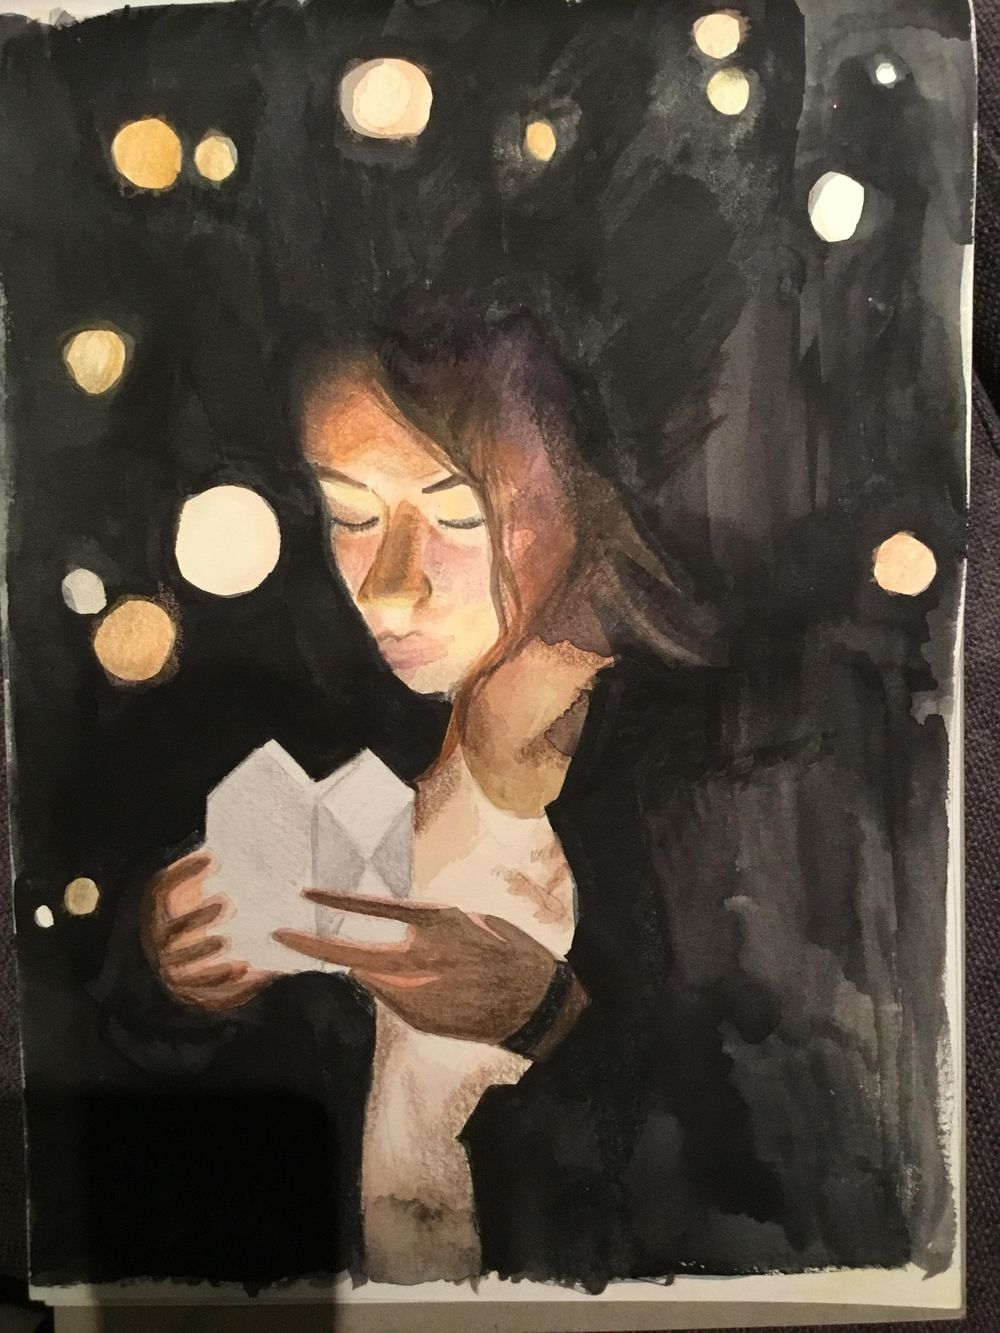 Dark - image 1 - student project